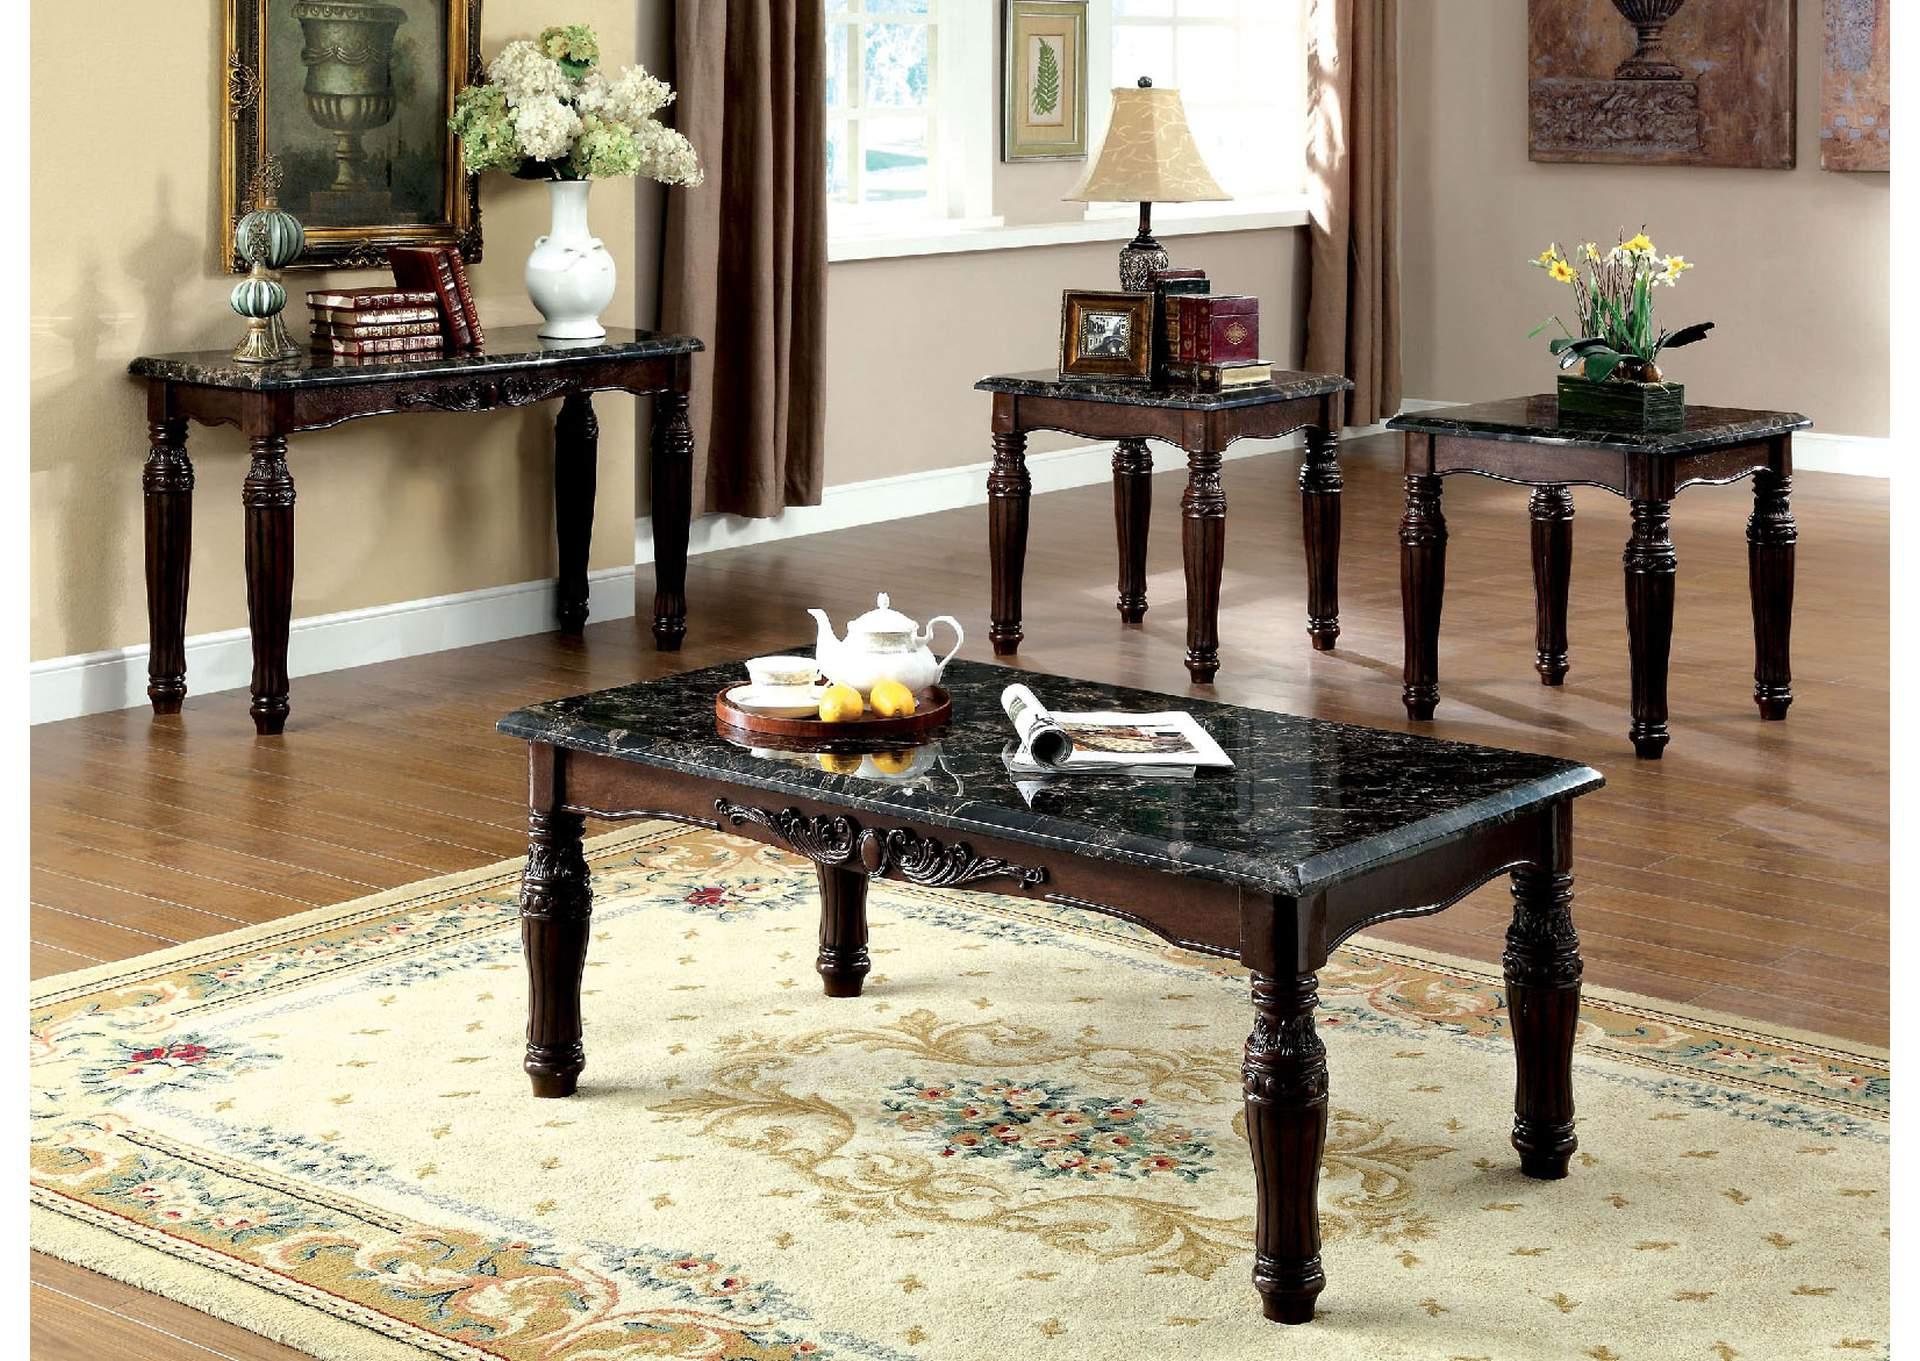 Living Room Sets Baton Rouge La furniture liquidators - baton rouge, la brampton 3 piece dark